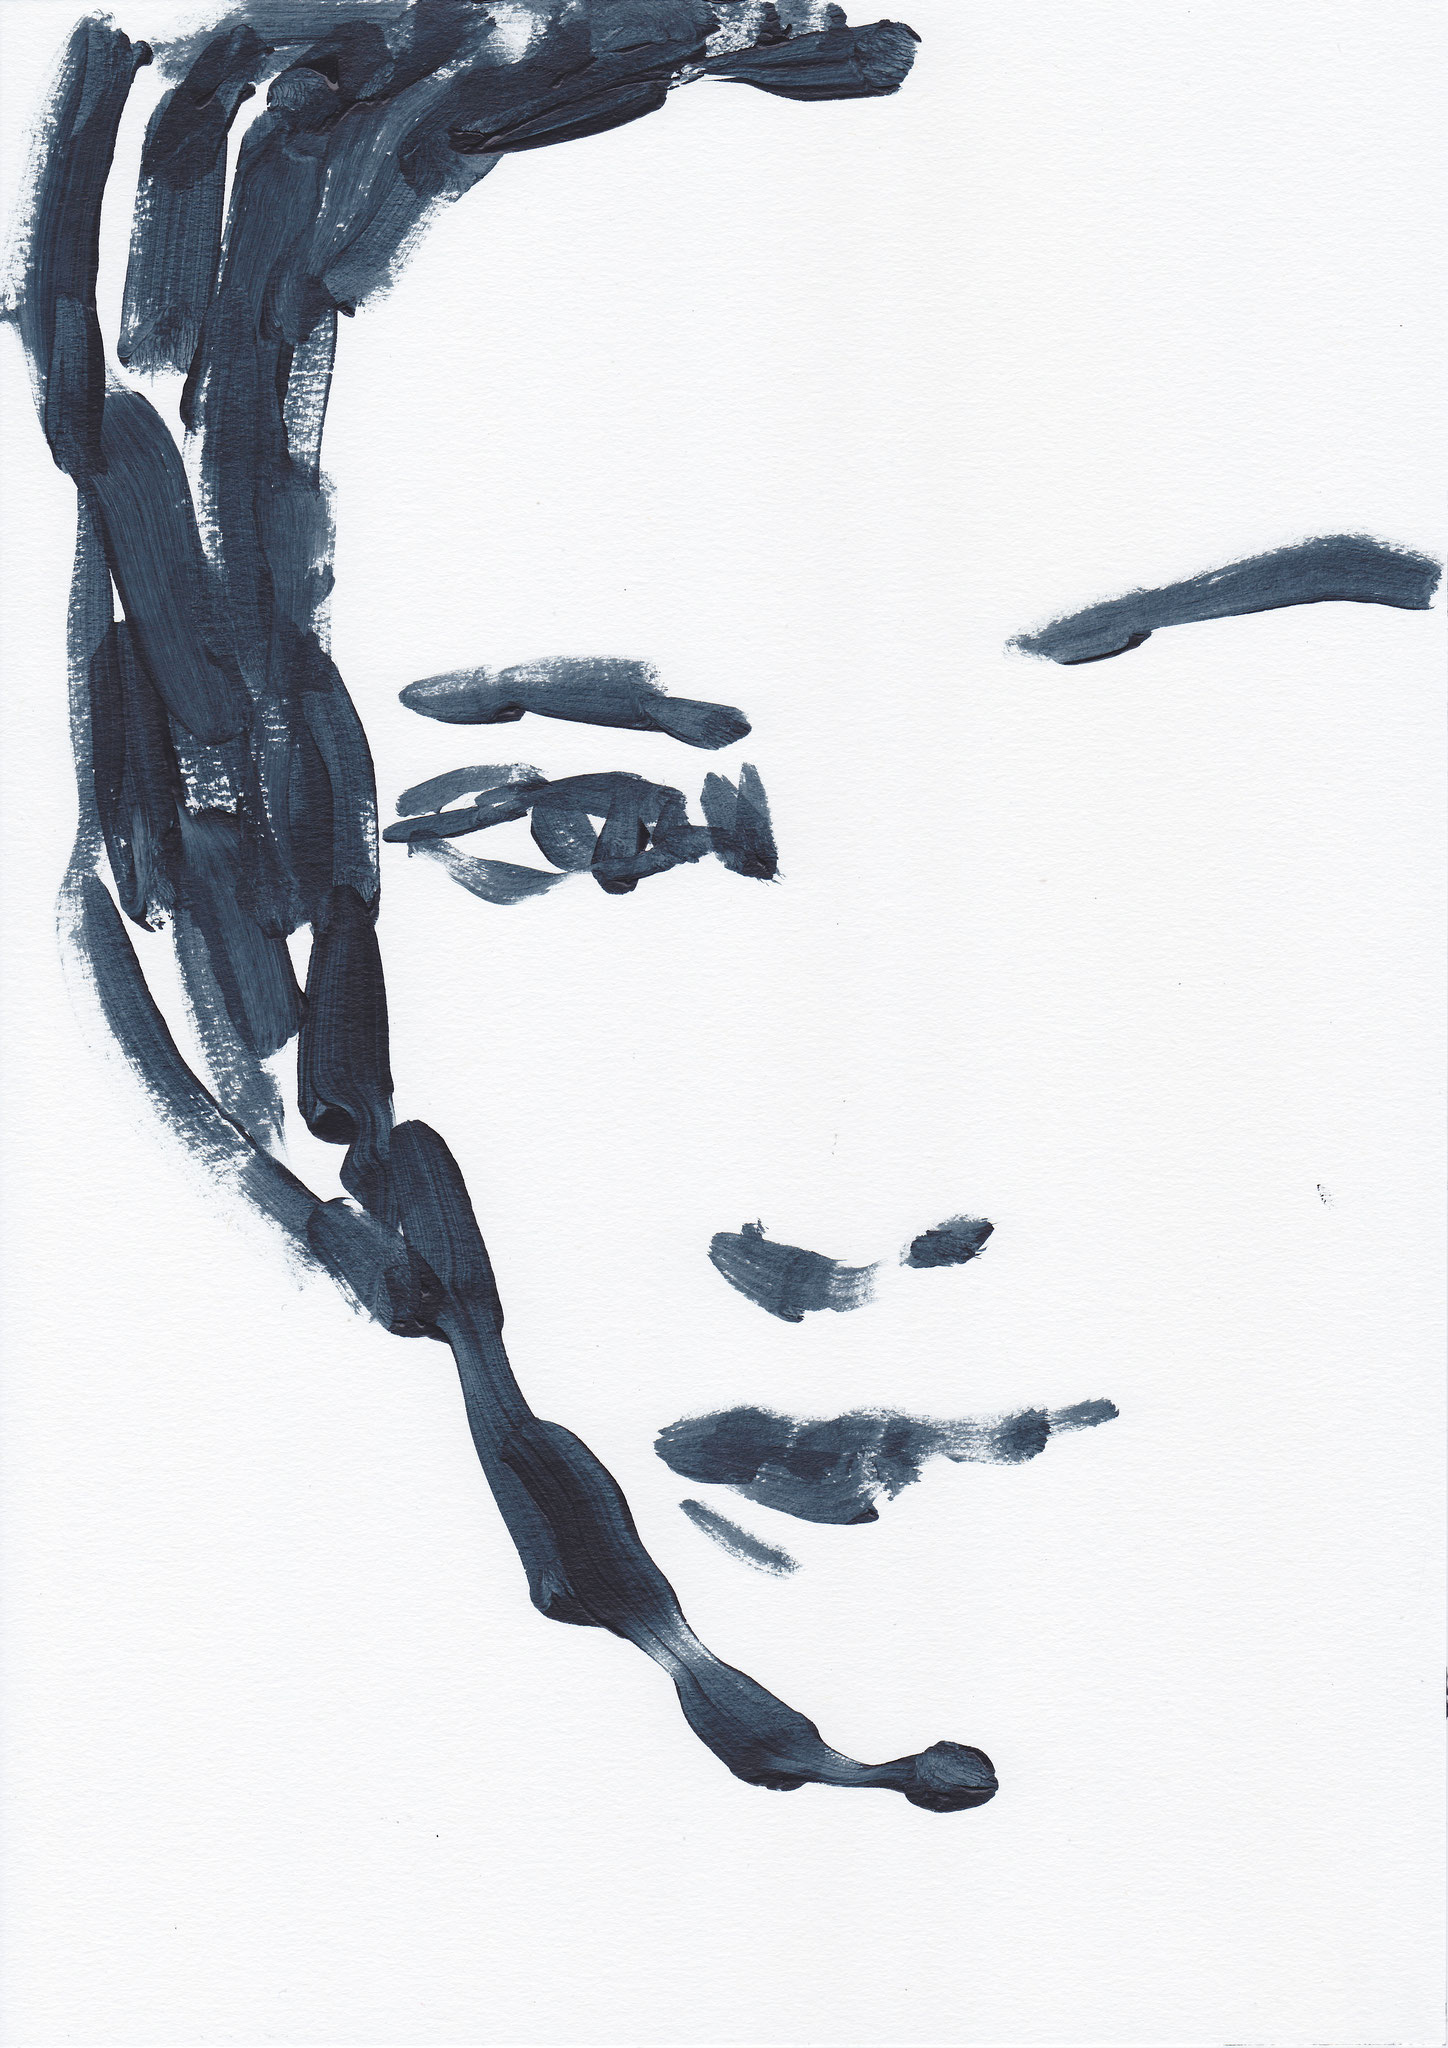 049 , acrylic on paper , 29.7 x 21cm , Selina Saranova